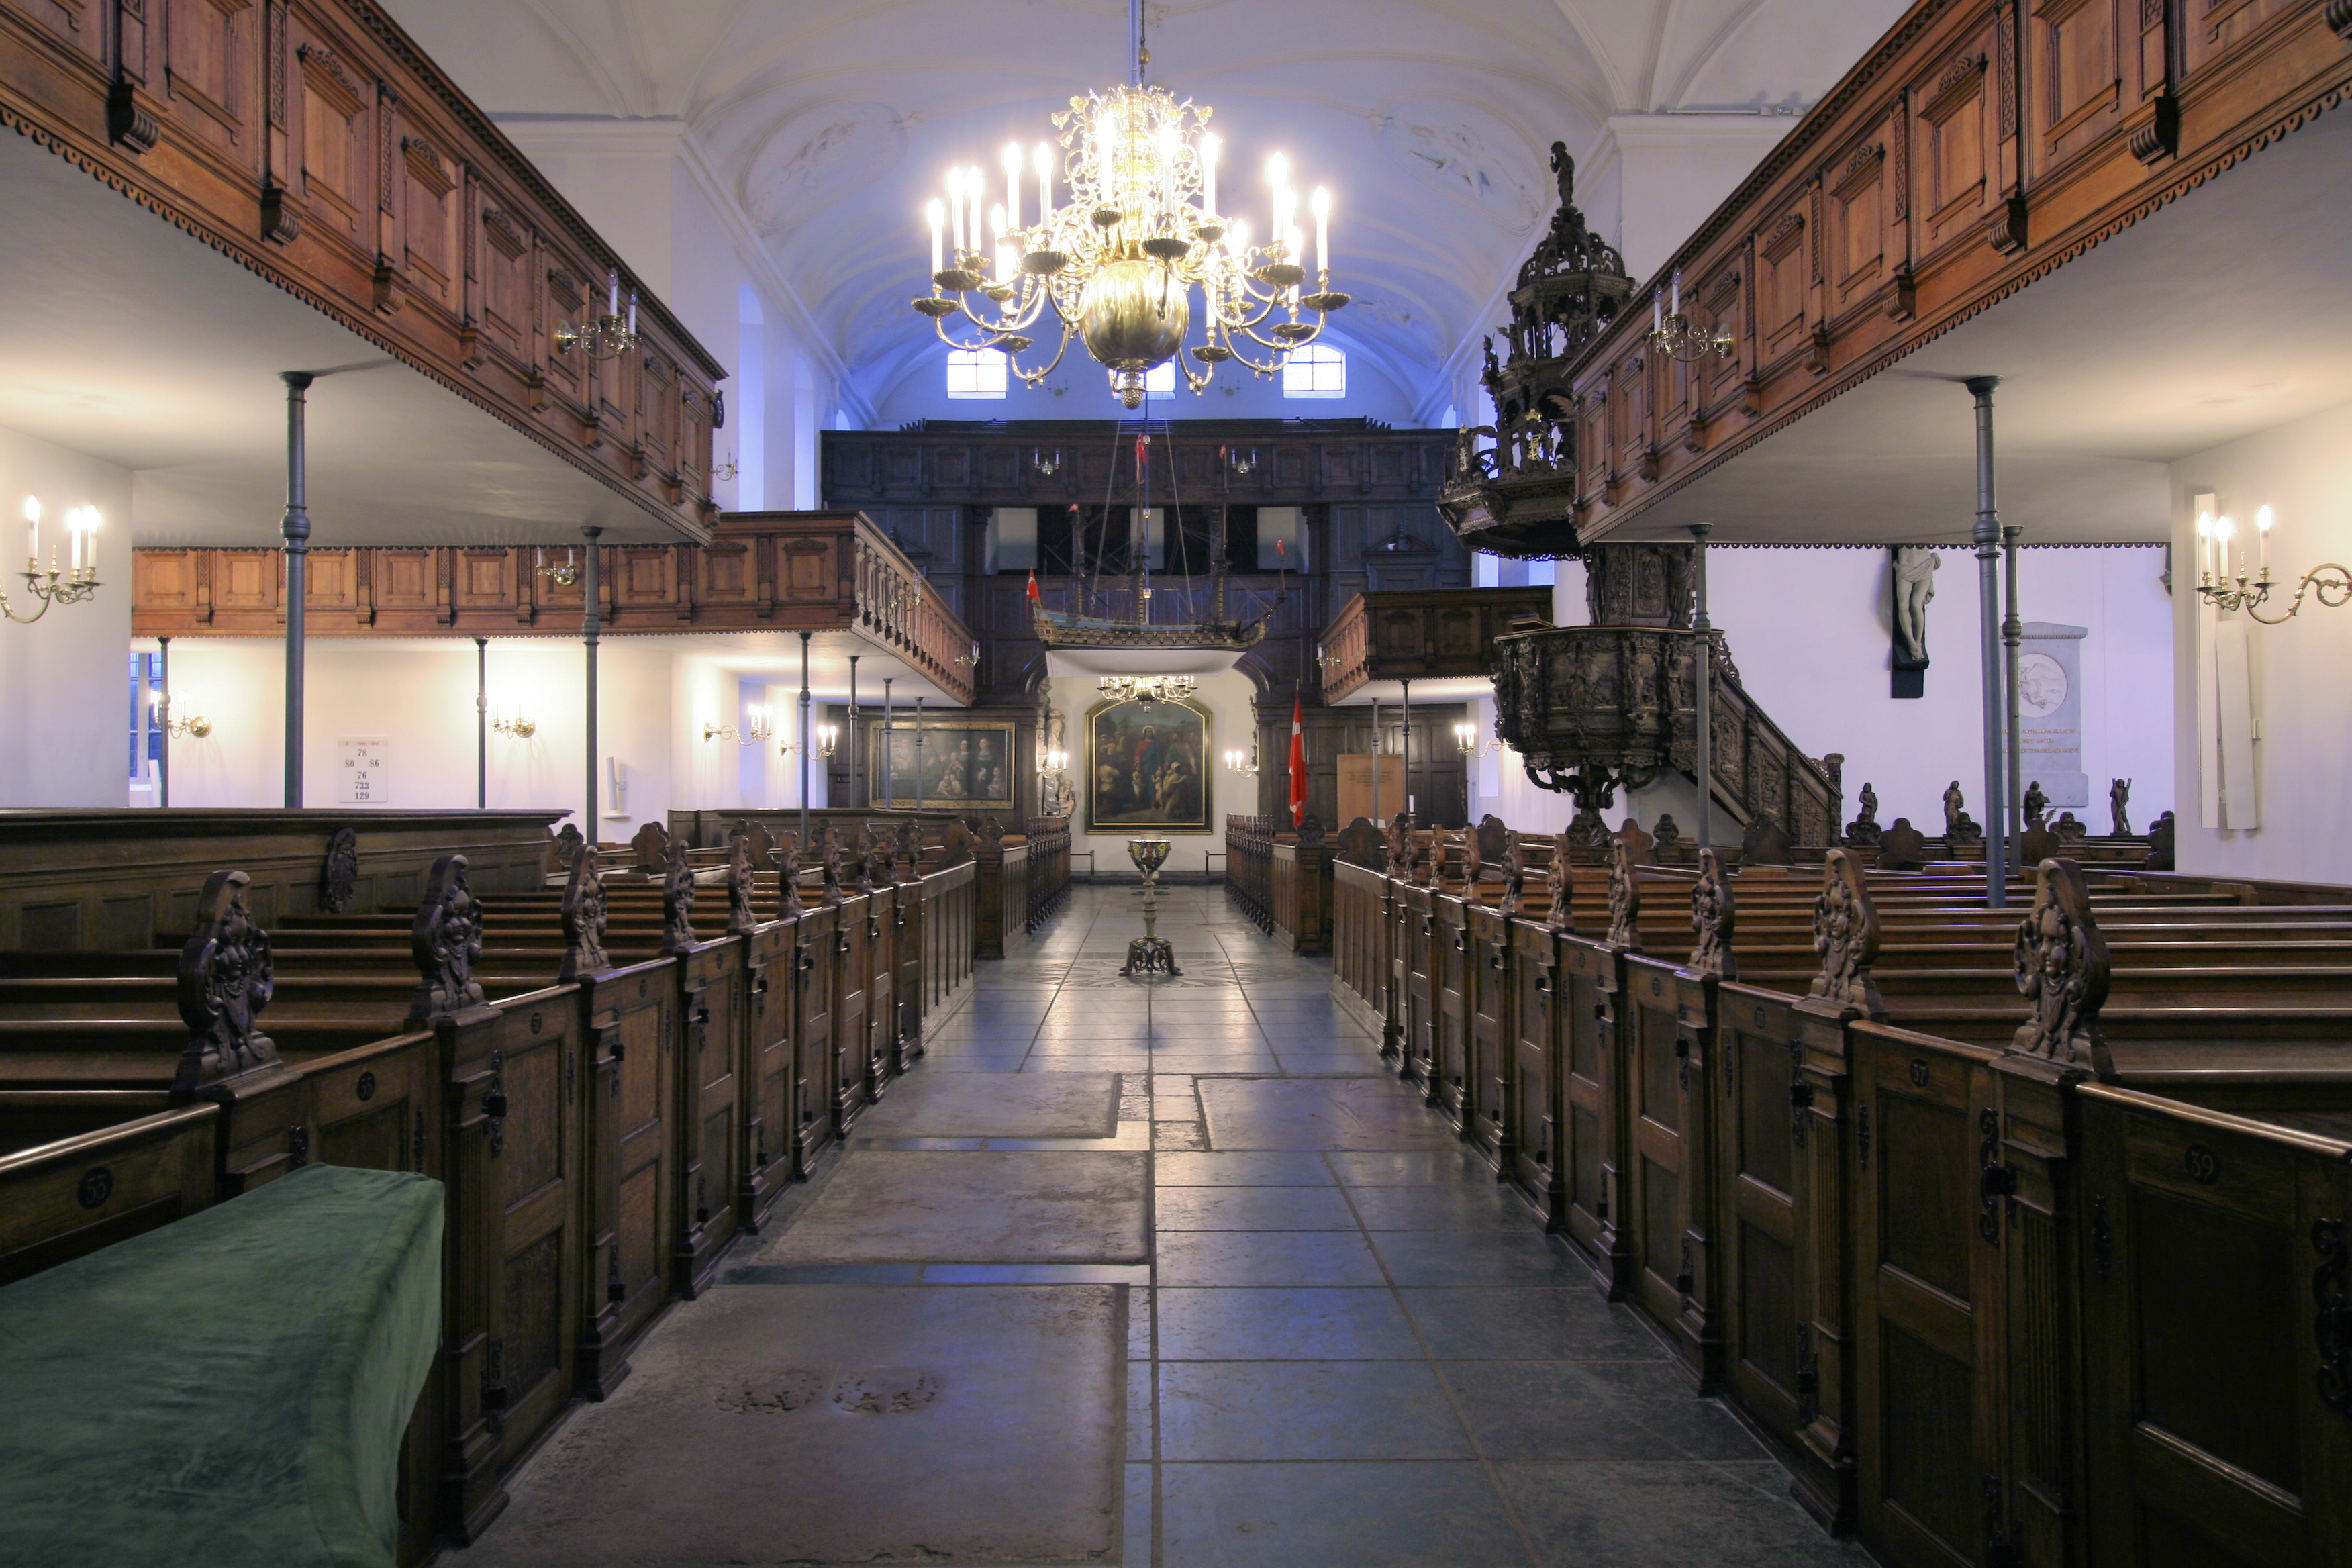 File:Holmens Kirke Copenhagen interior from north.jpg - Wikimedia Commons